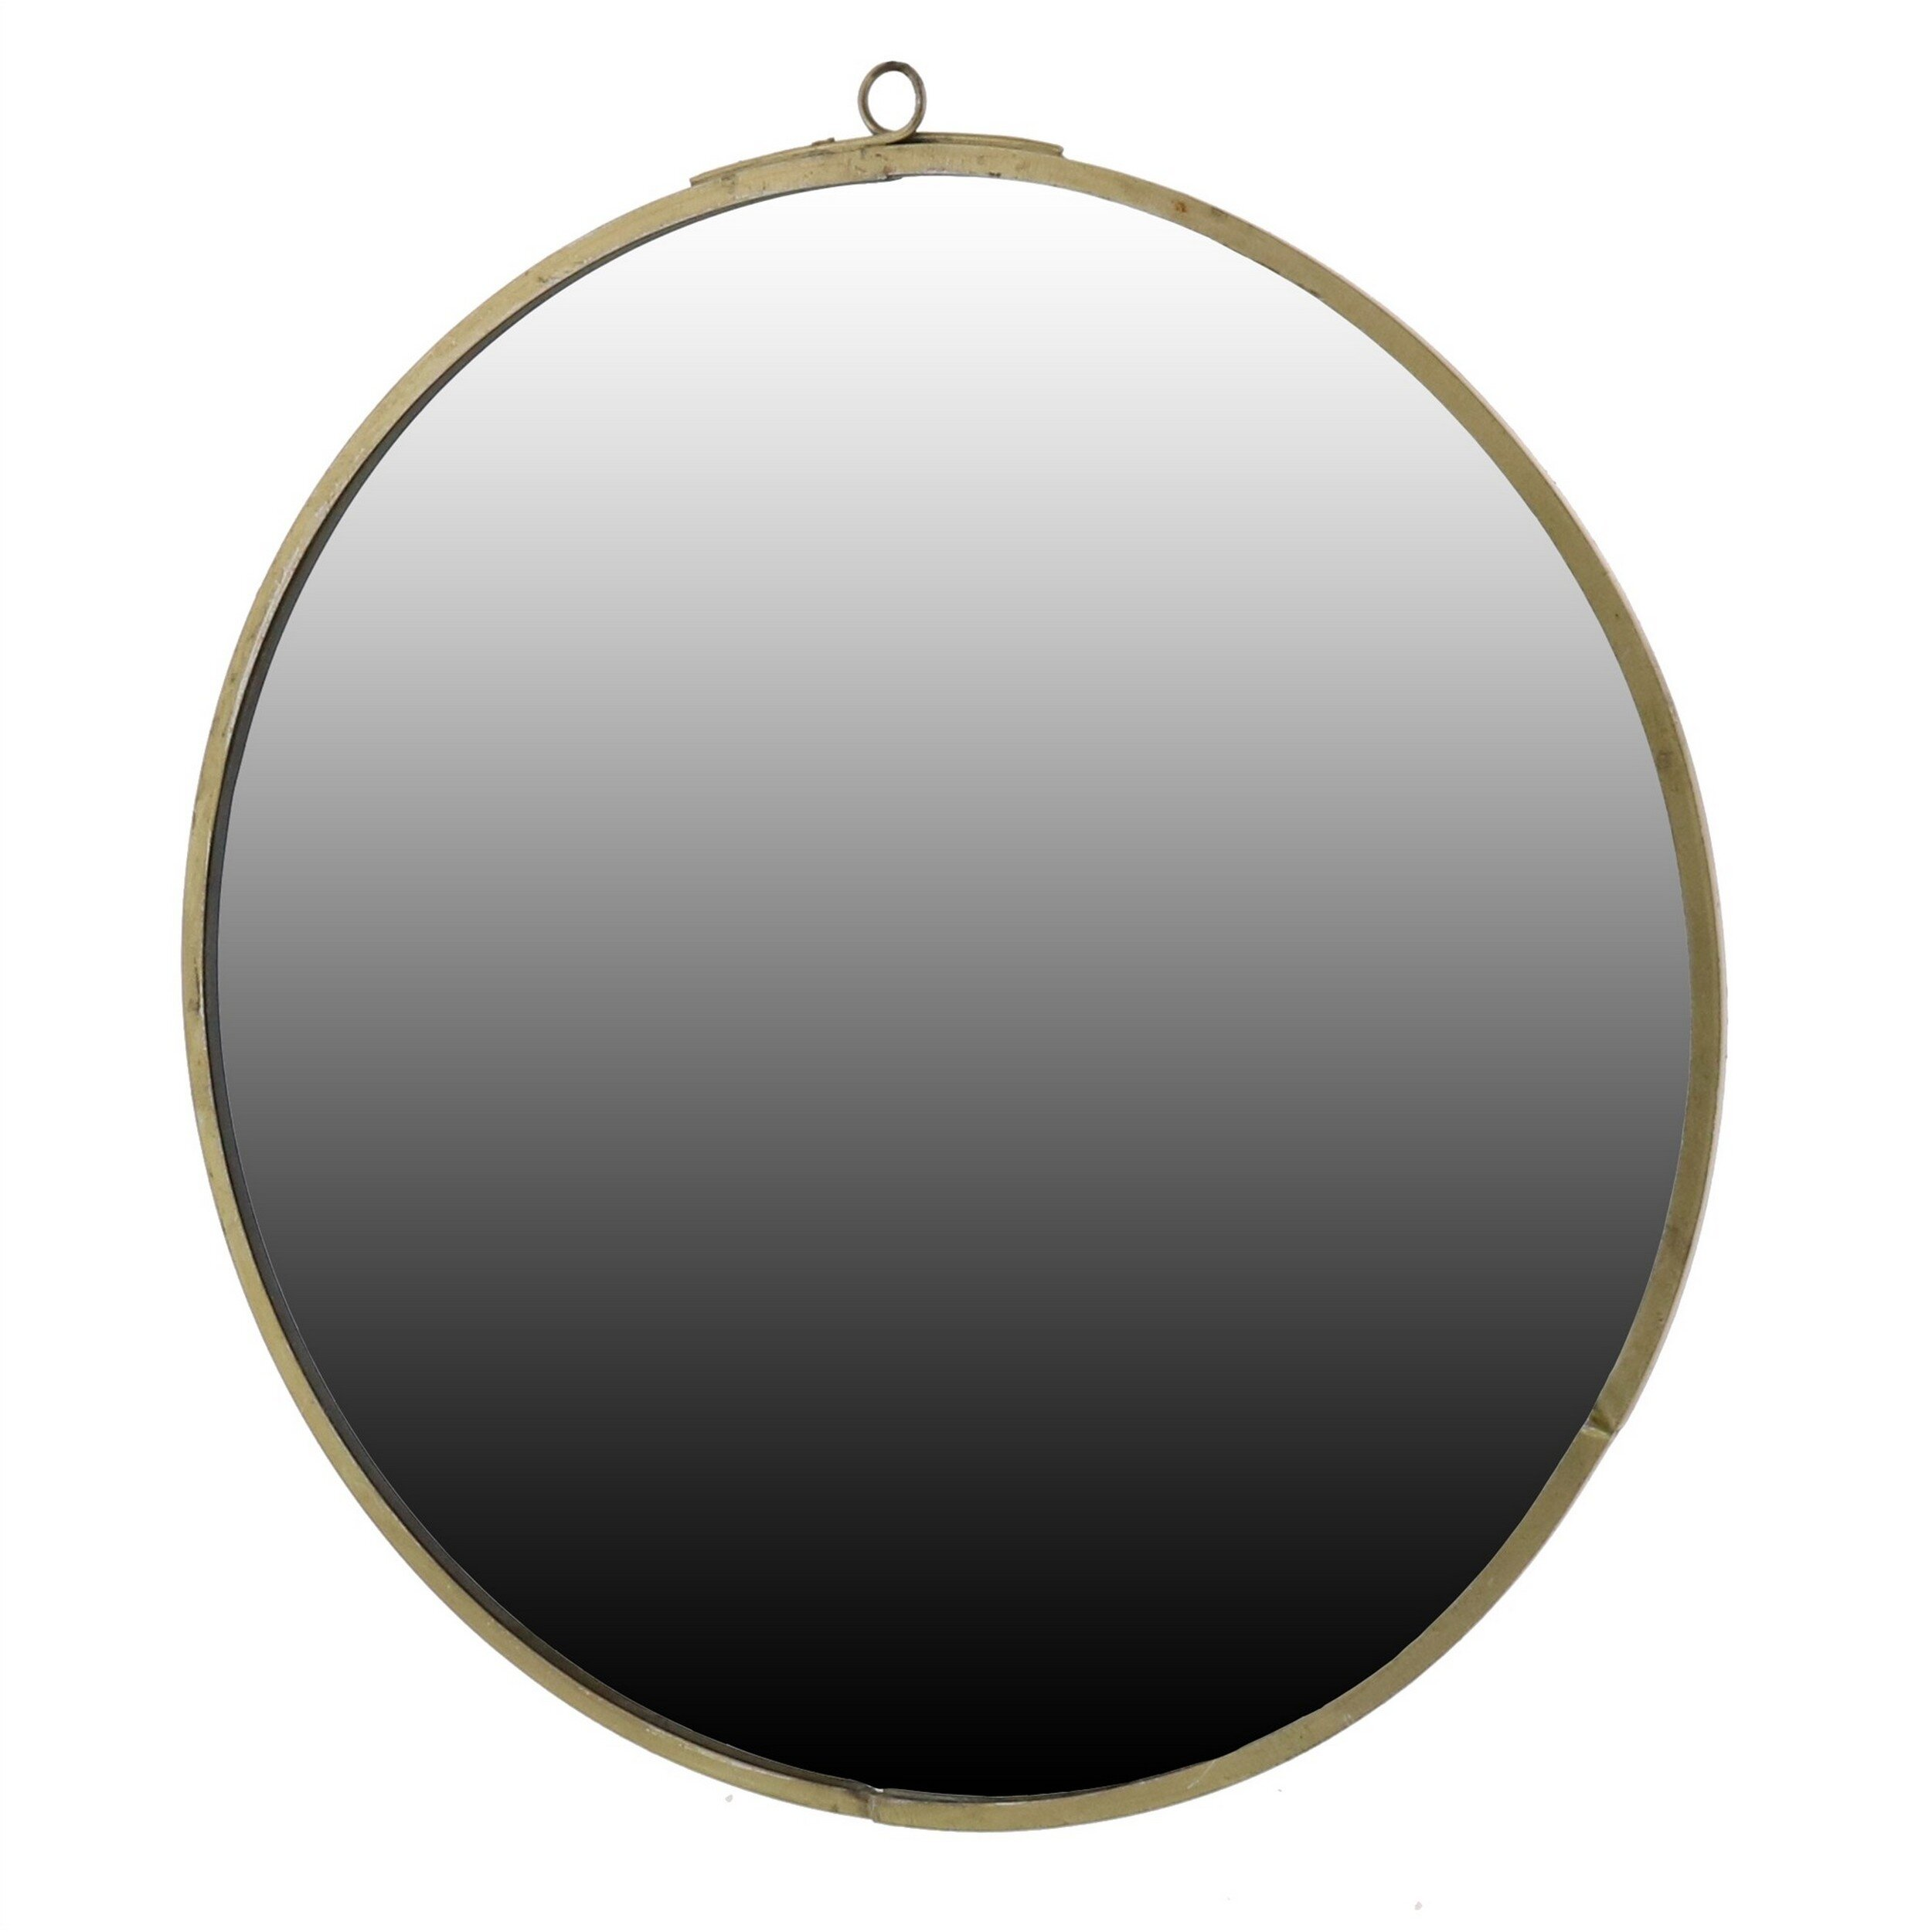 Brass Round Mirrors Free Shipping Over 35 Wayfair